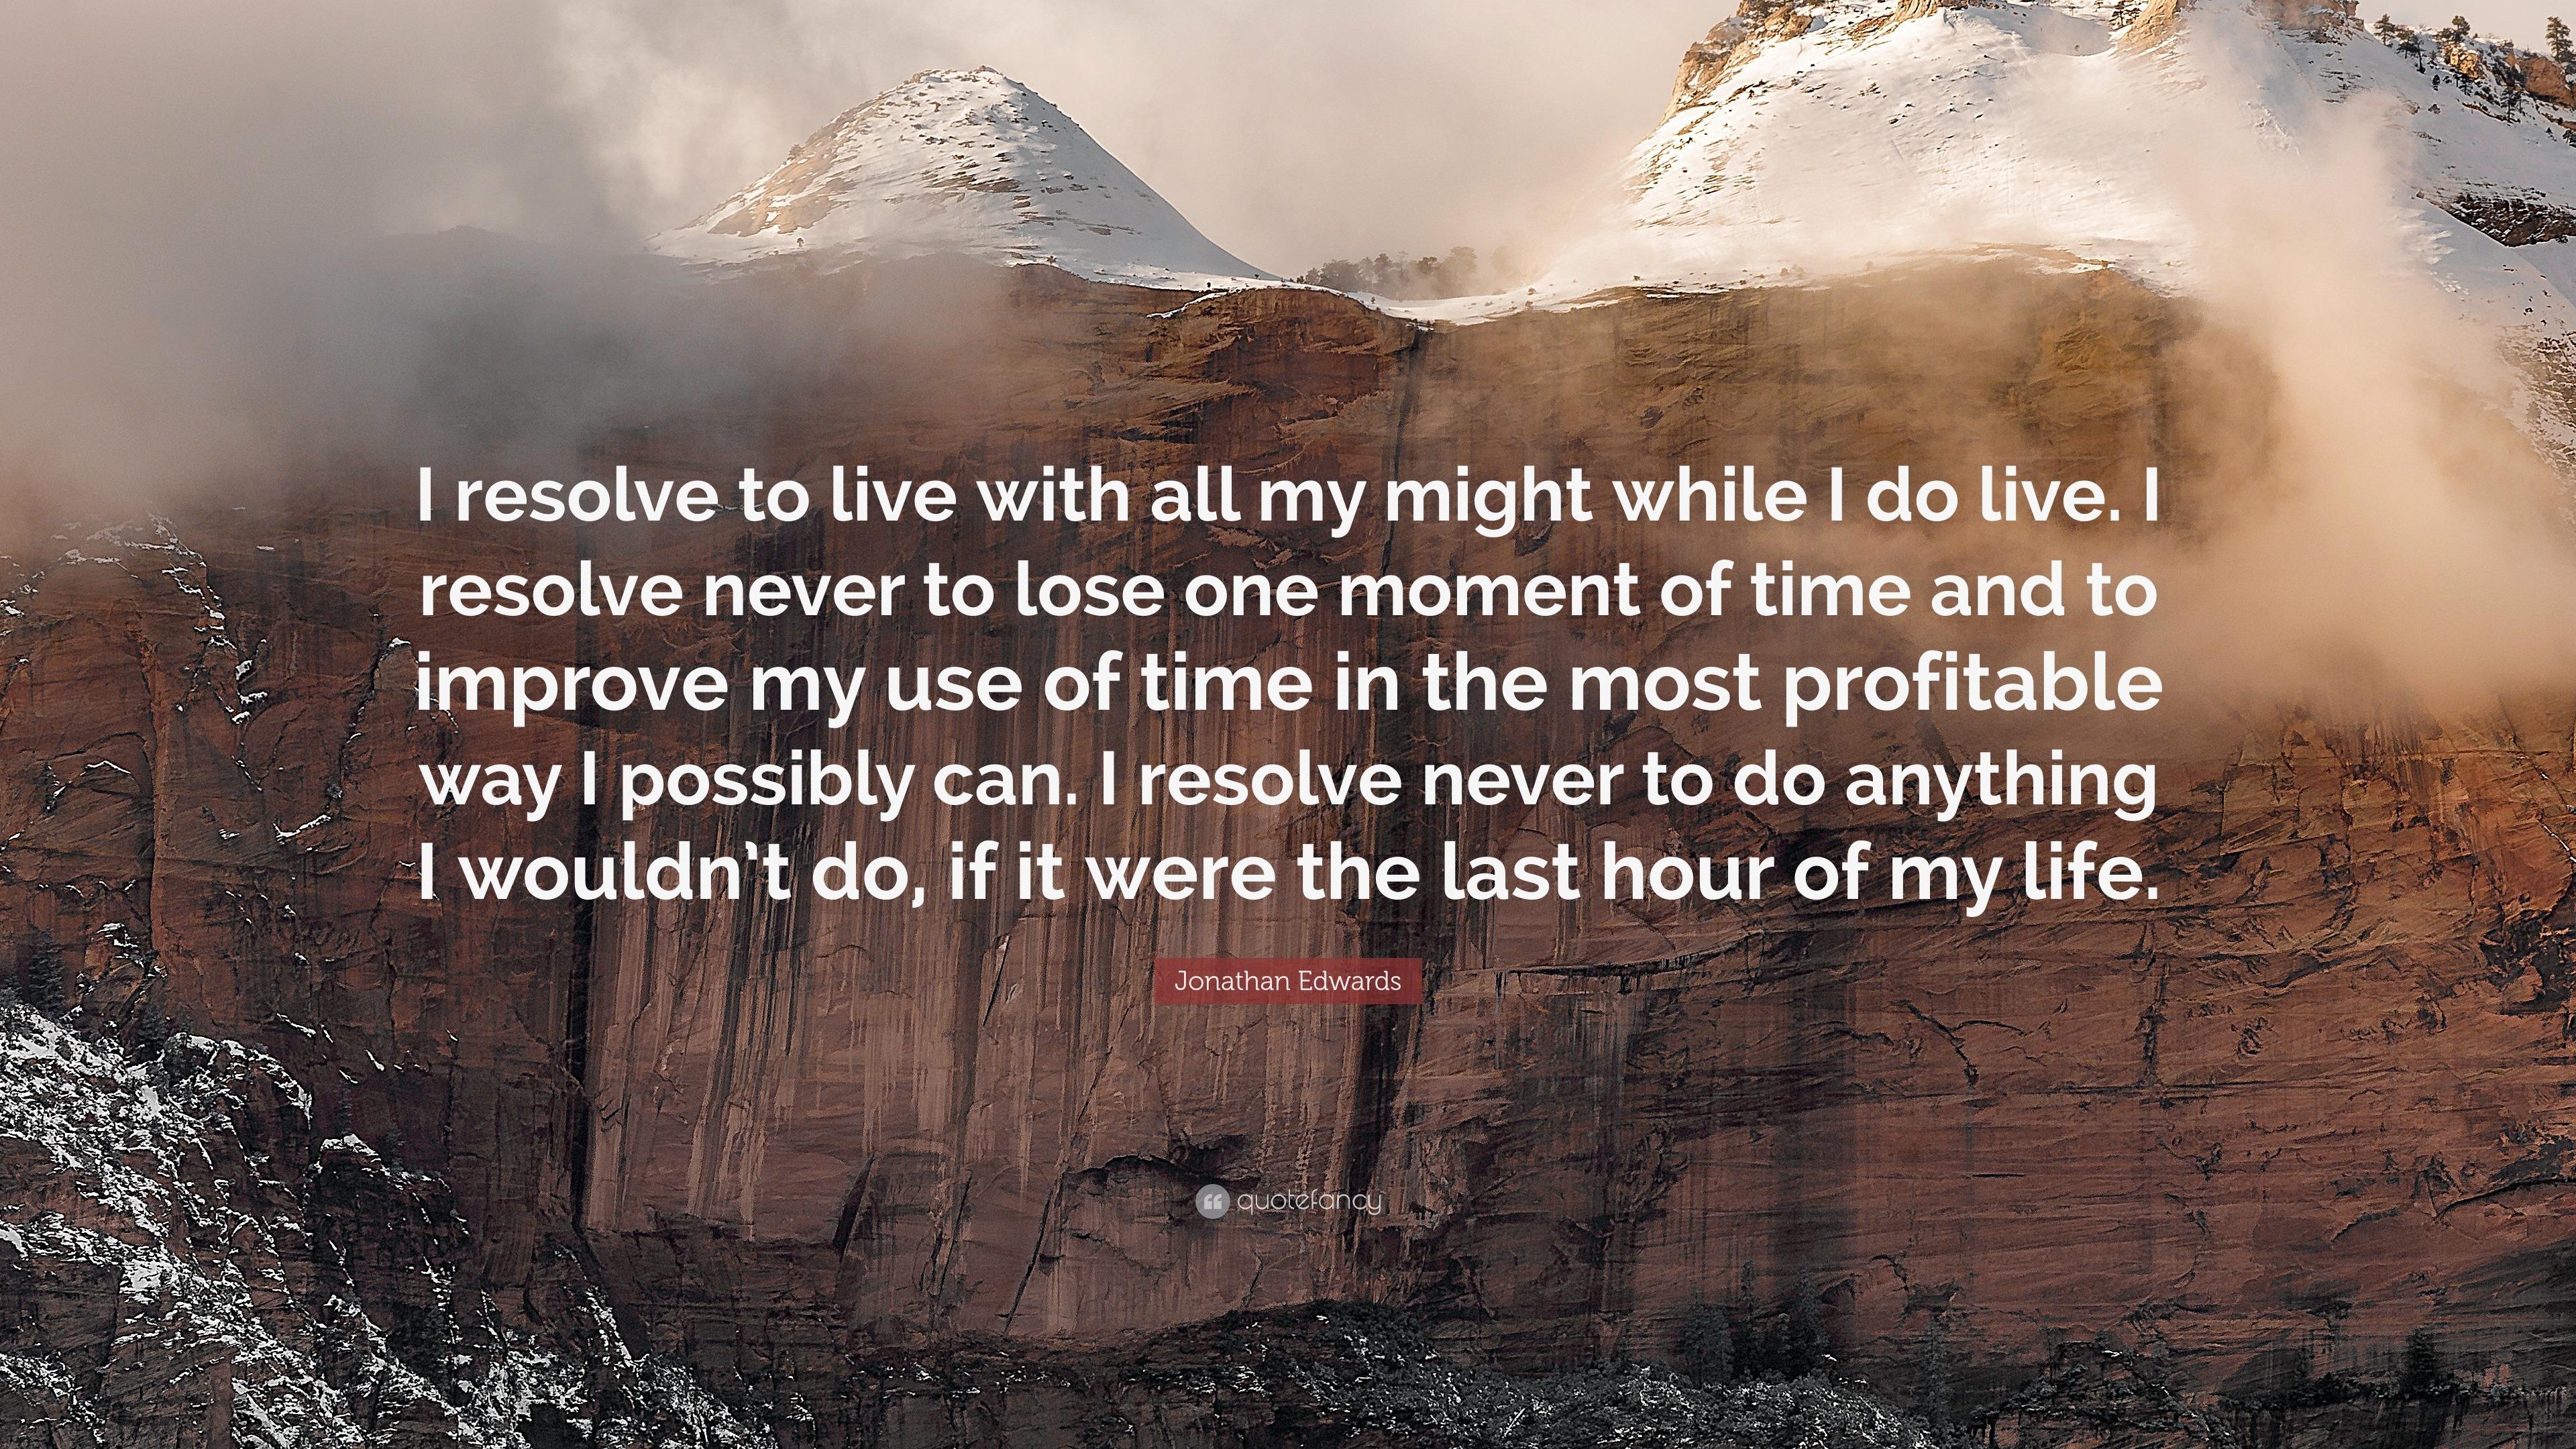 Jonathan Edwards Quotes